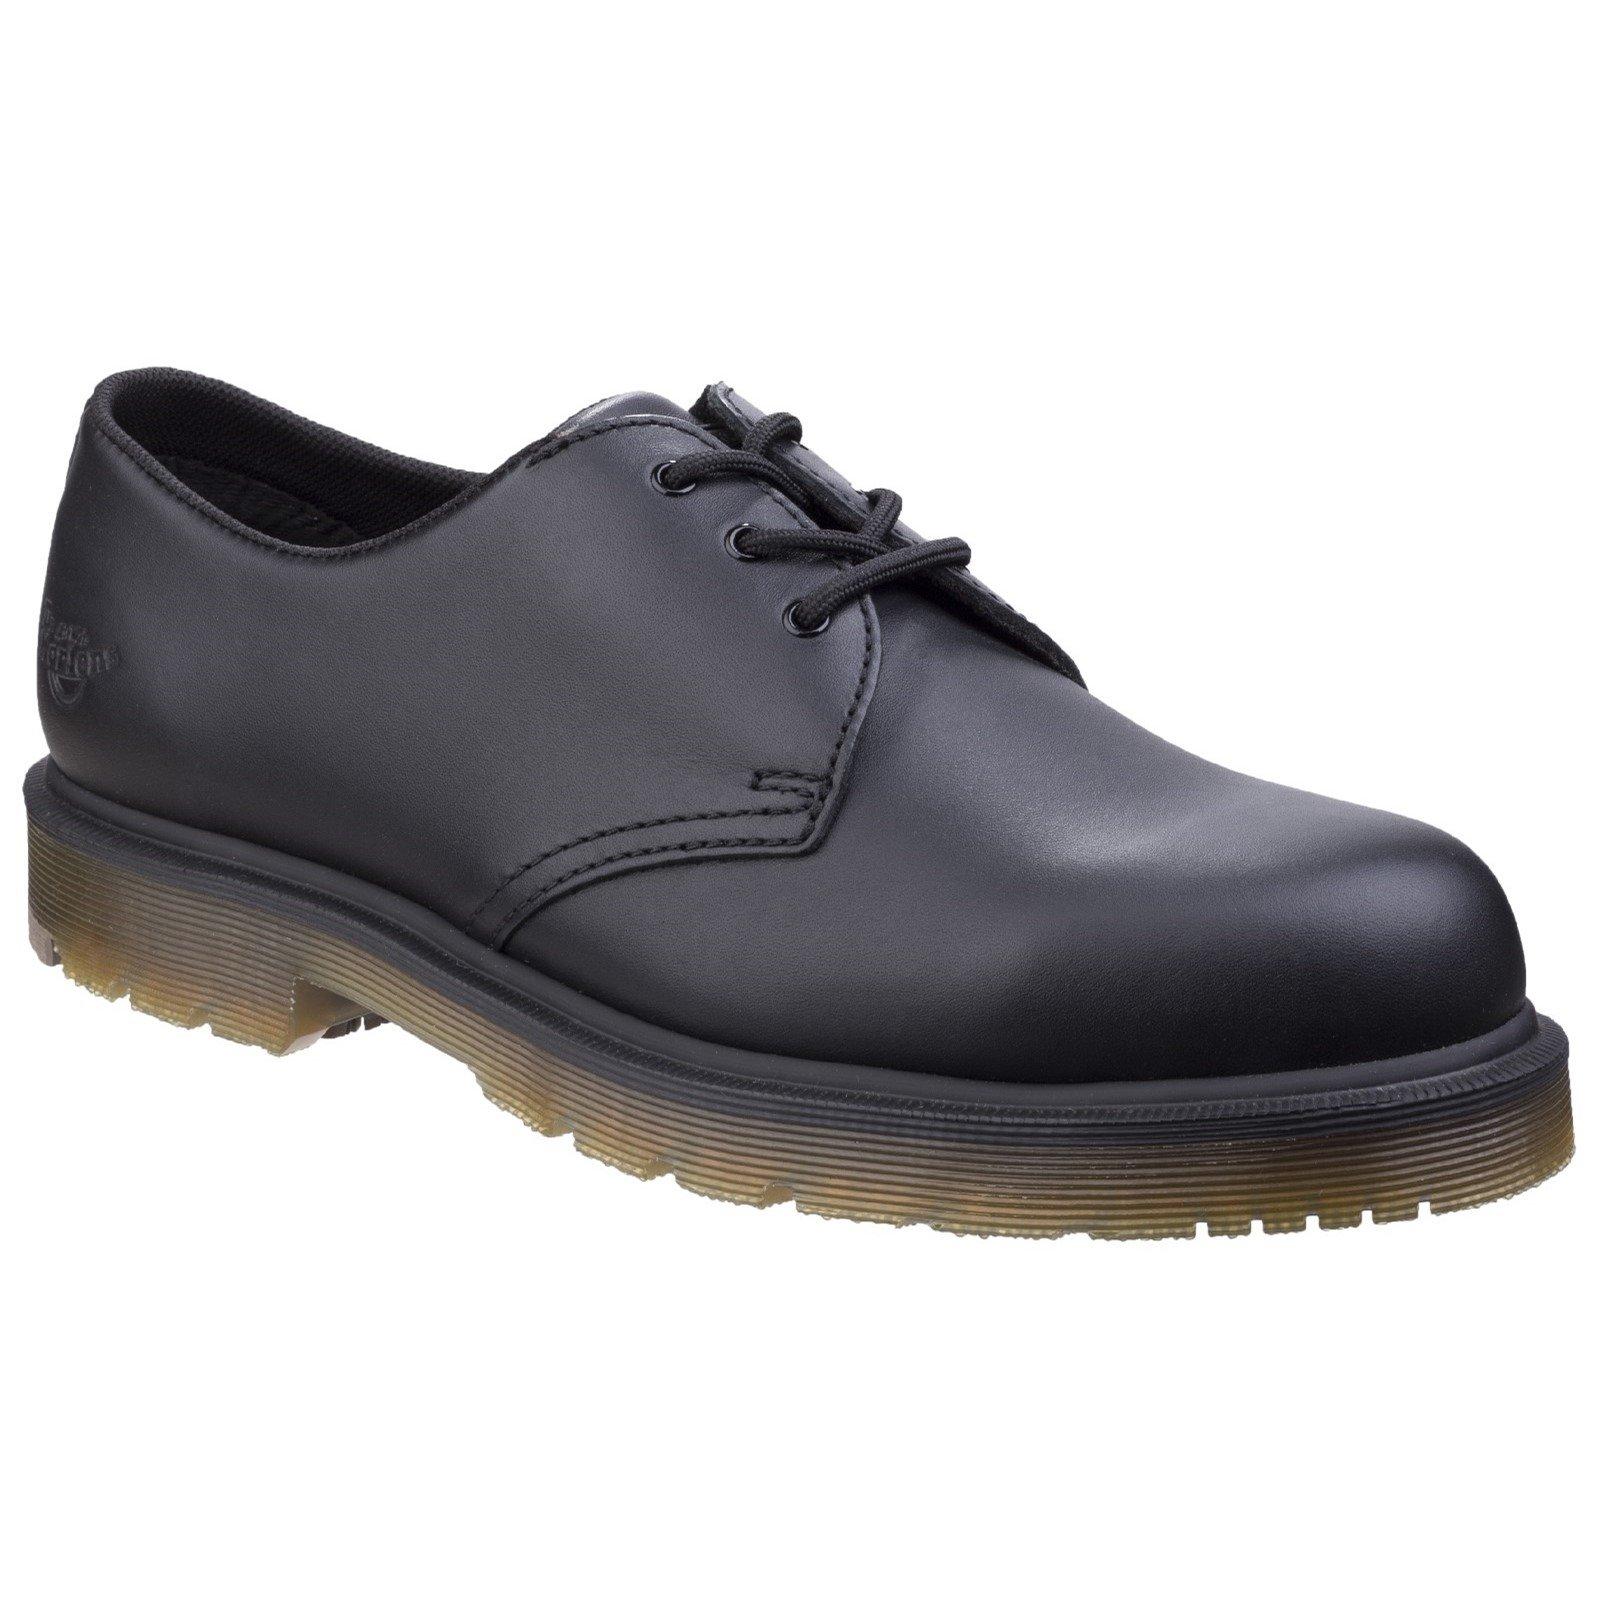 Dr Martens Men's Arlington NS Derby Shoe Black 26781 - Black Industrial Full Grain 12